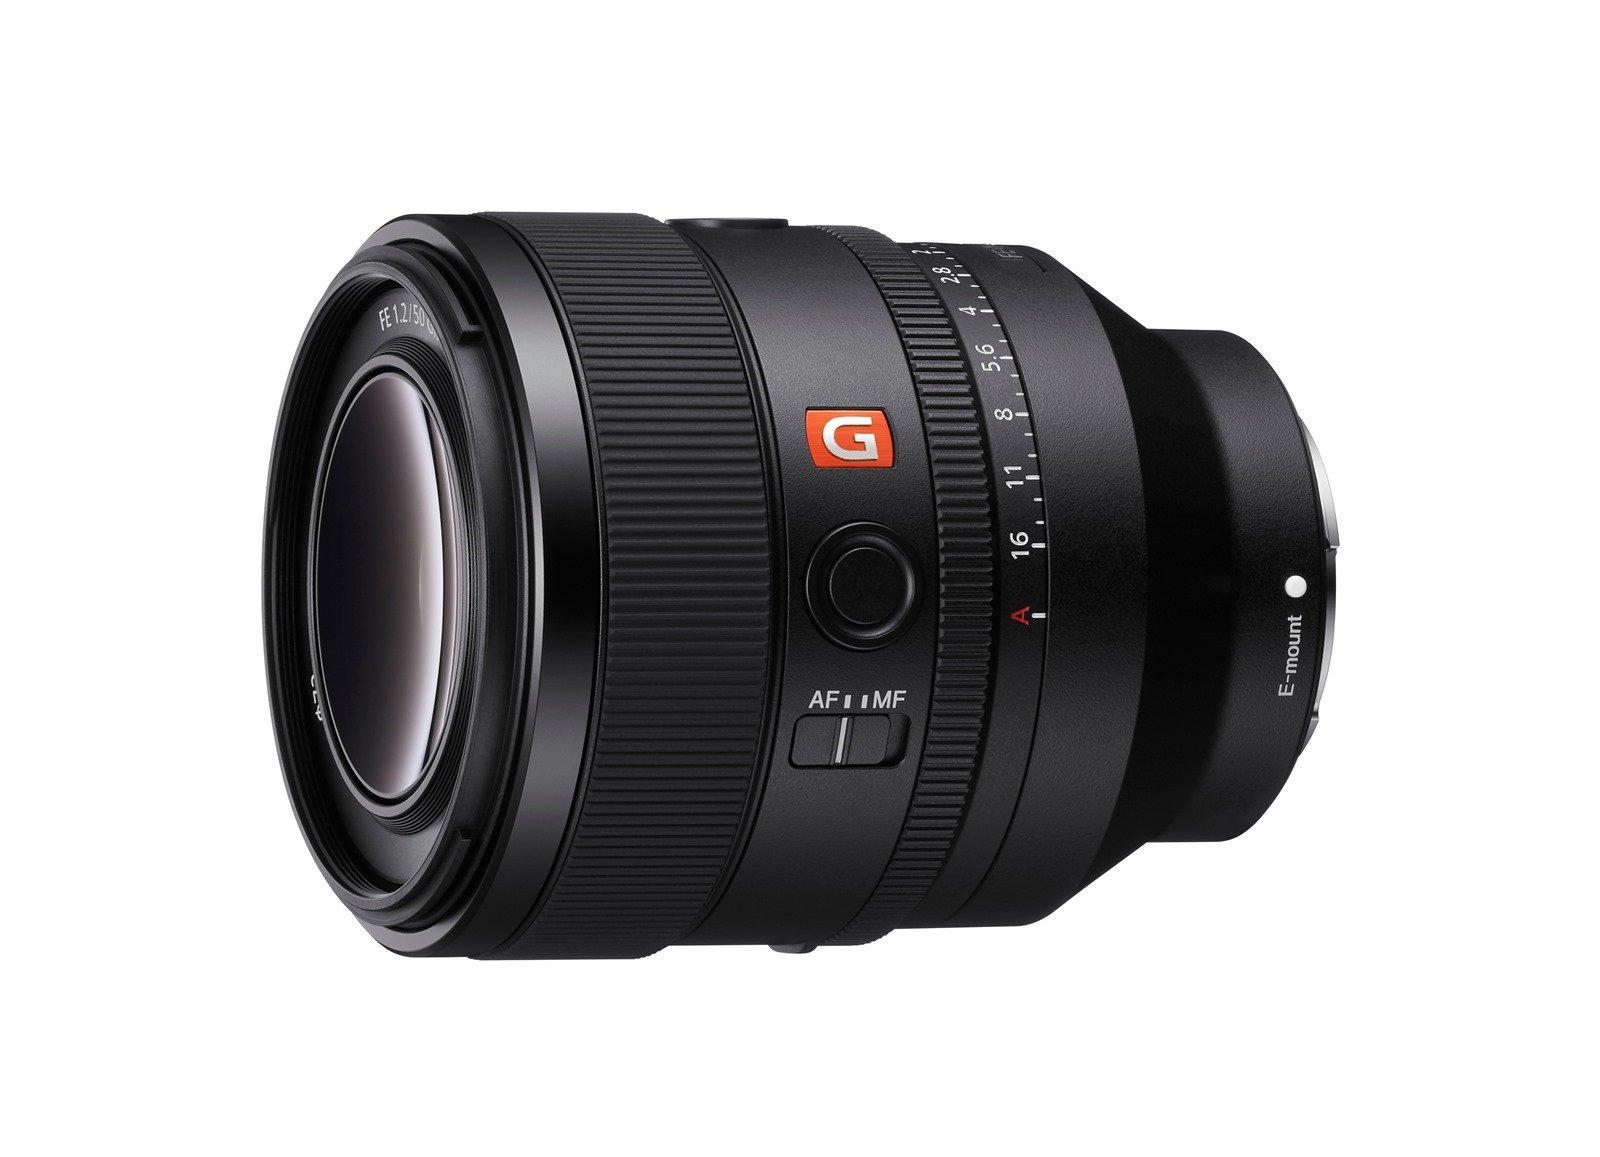 Sony FE 50mm F1.2 GM 全片幅大光圈定焦鏡 極致光學工藝展現 同場加映收音利器:全新 ECM-W2BT 無線麥克風、ECM-LV1 輕巧型領夾式立體聲麥克風 @3C 達人廖阿輝